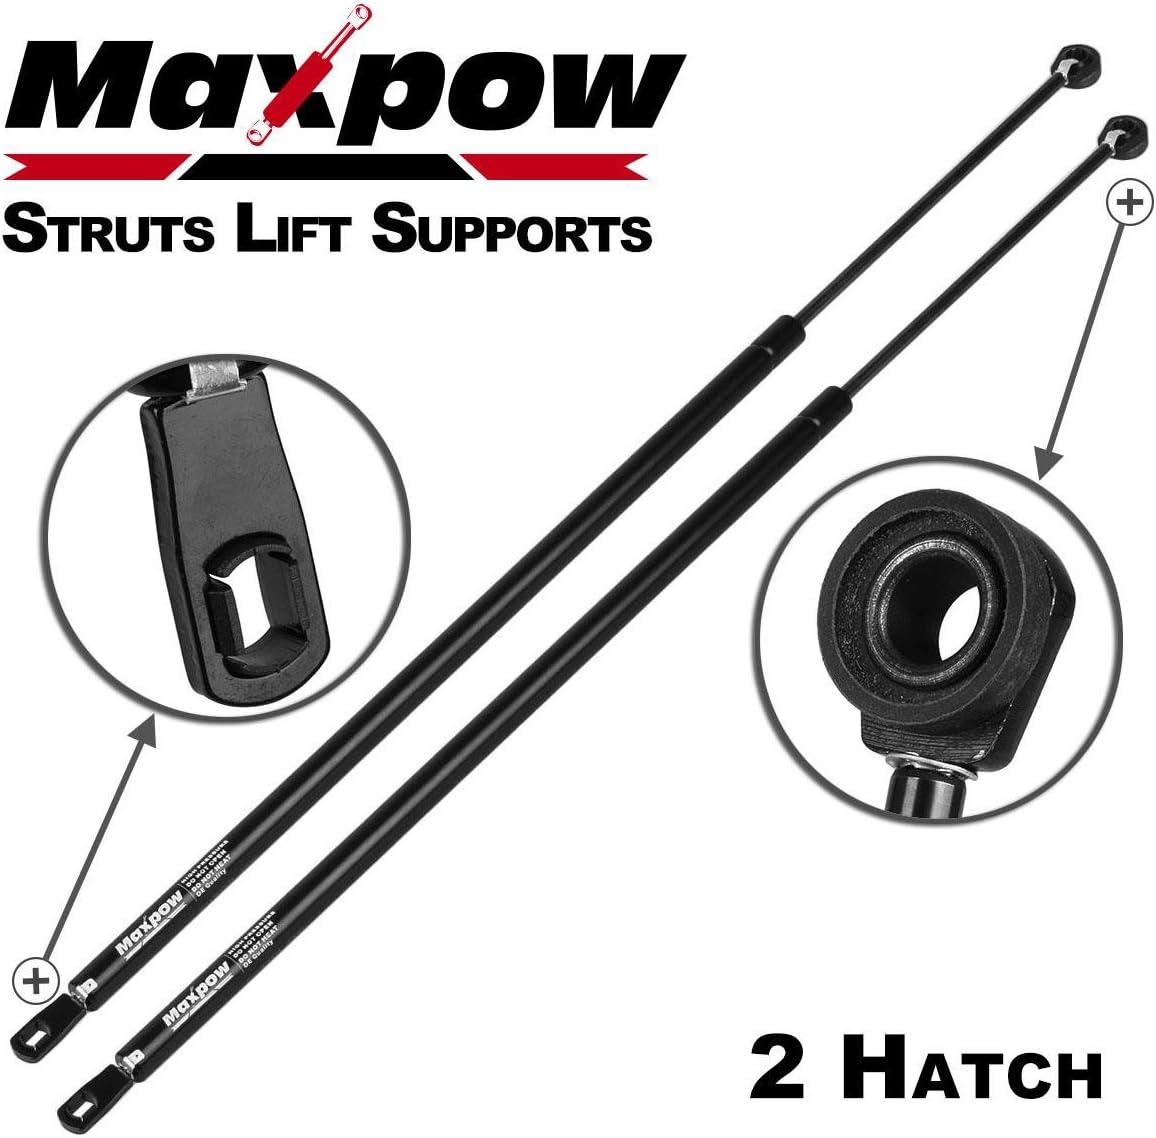 Hatch Lift Support Sachs SG130019 fits 95-02 Chevrolet Camaro